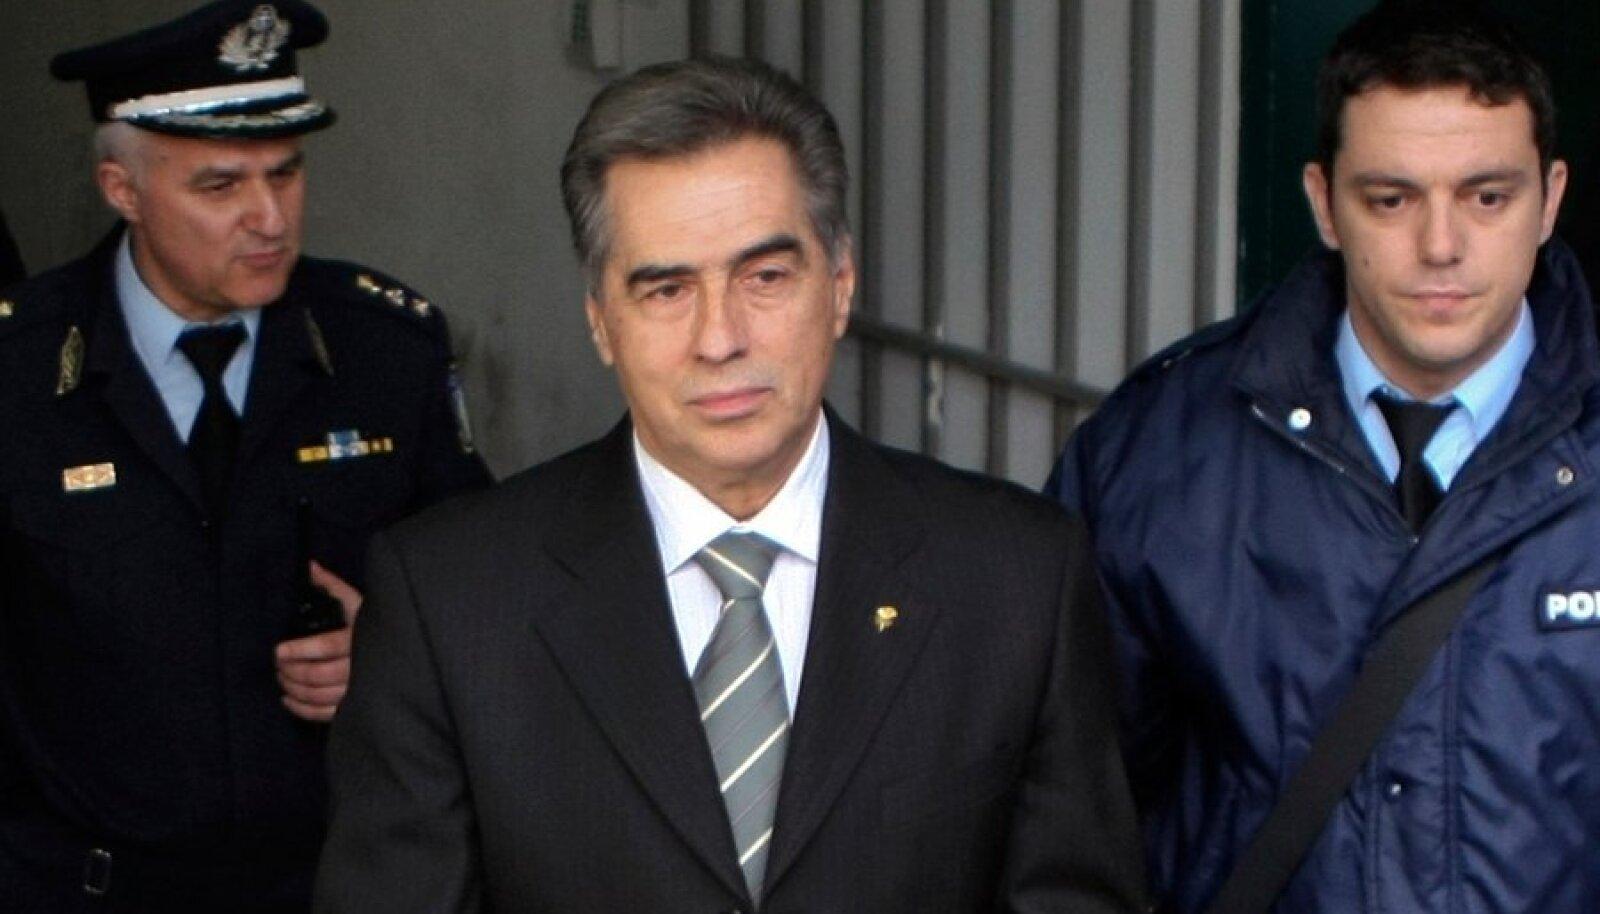 Vassilis Papageorgopoulos